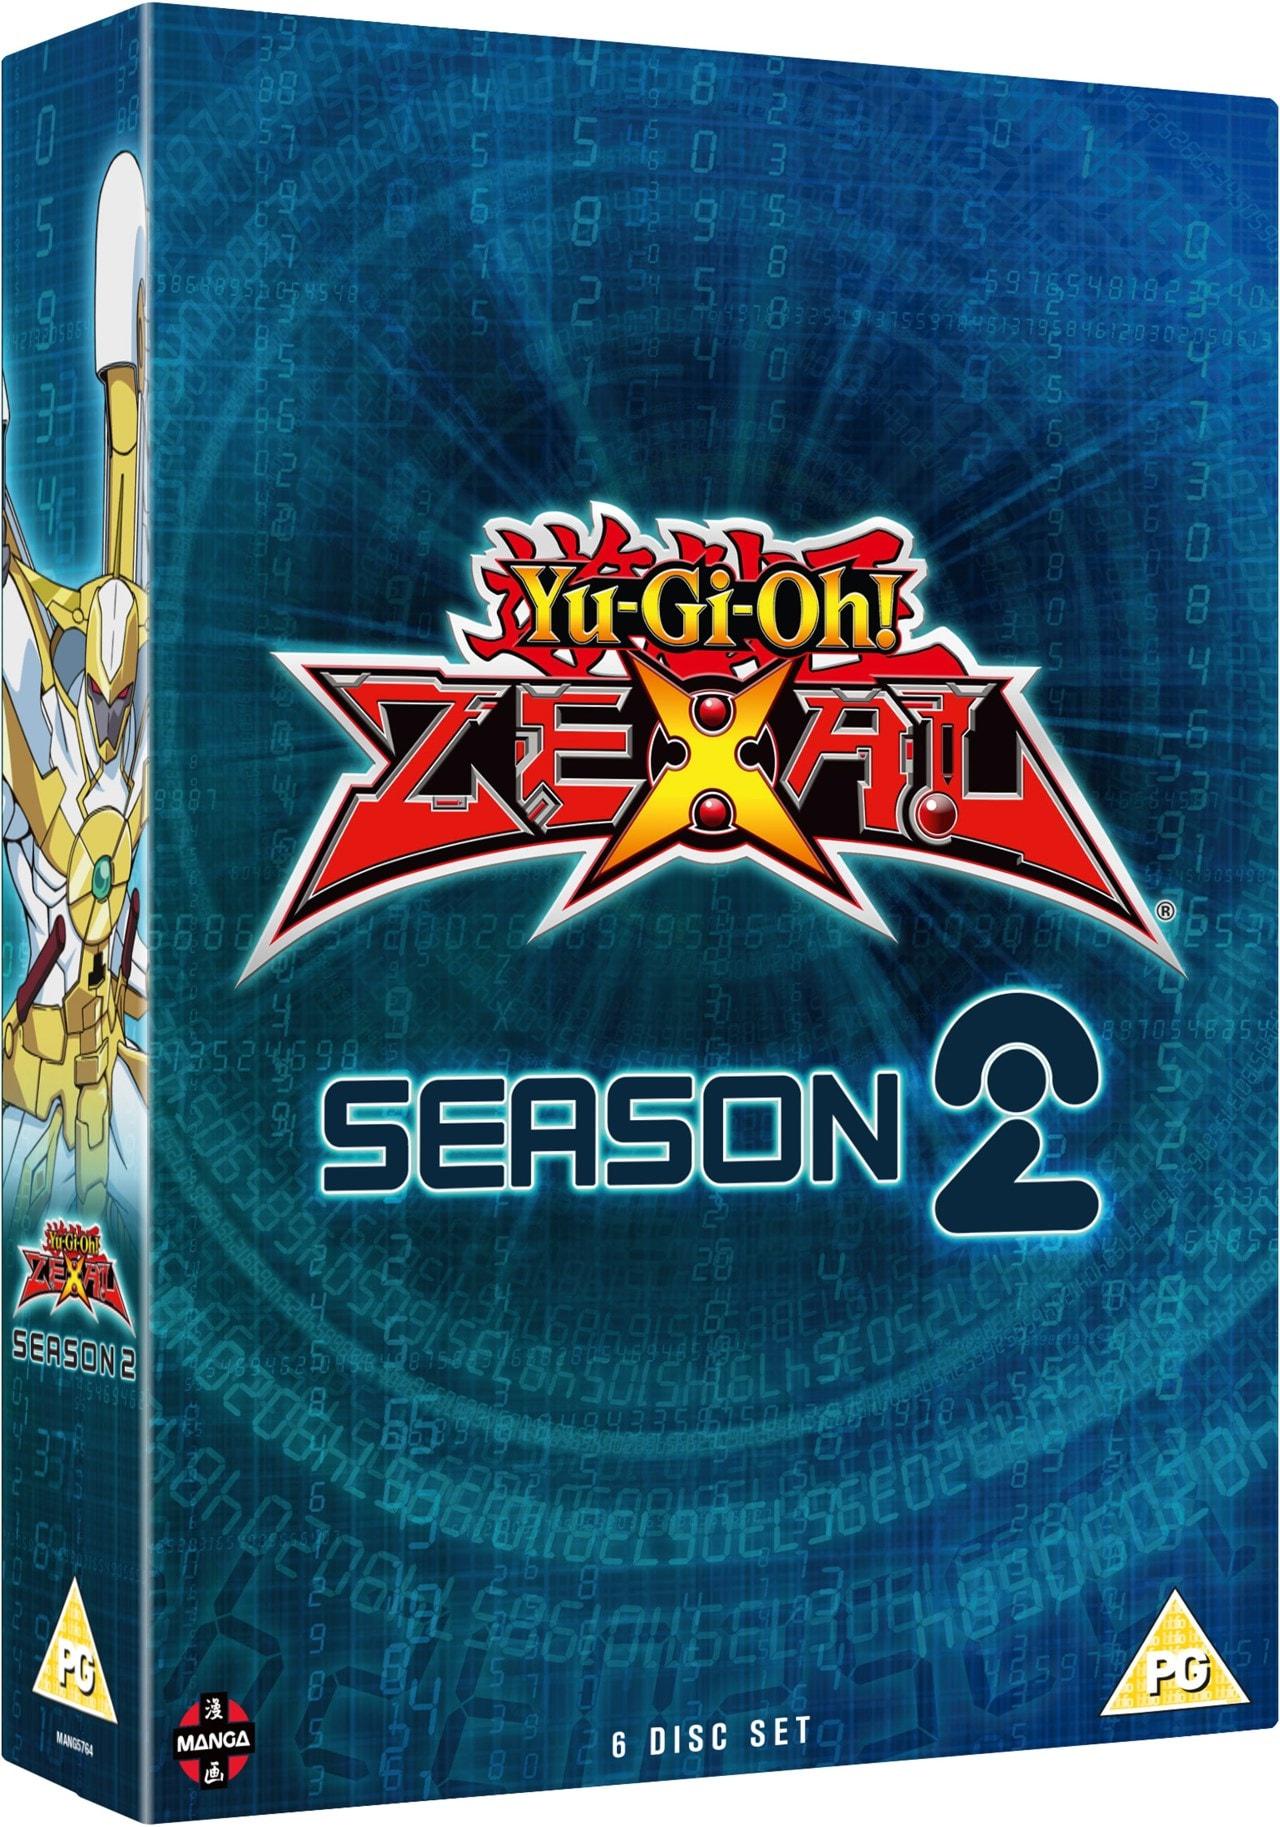 Yu-gi-oh! Zexal: Season 2 Complete Collection - 2